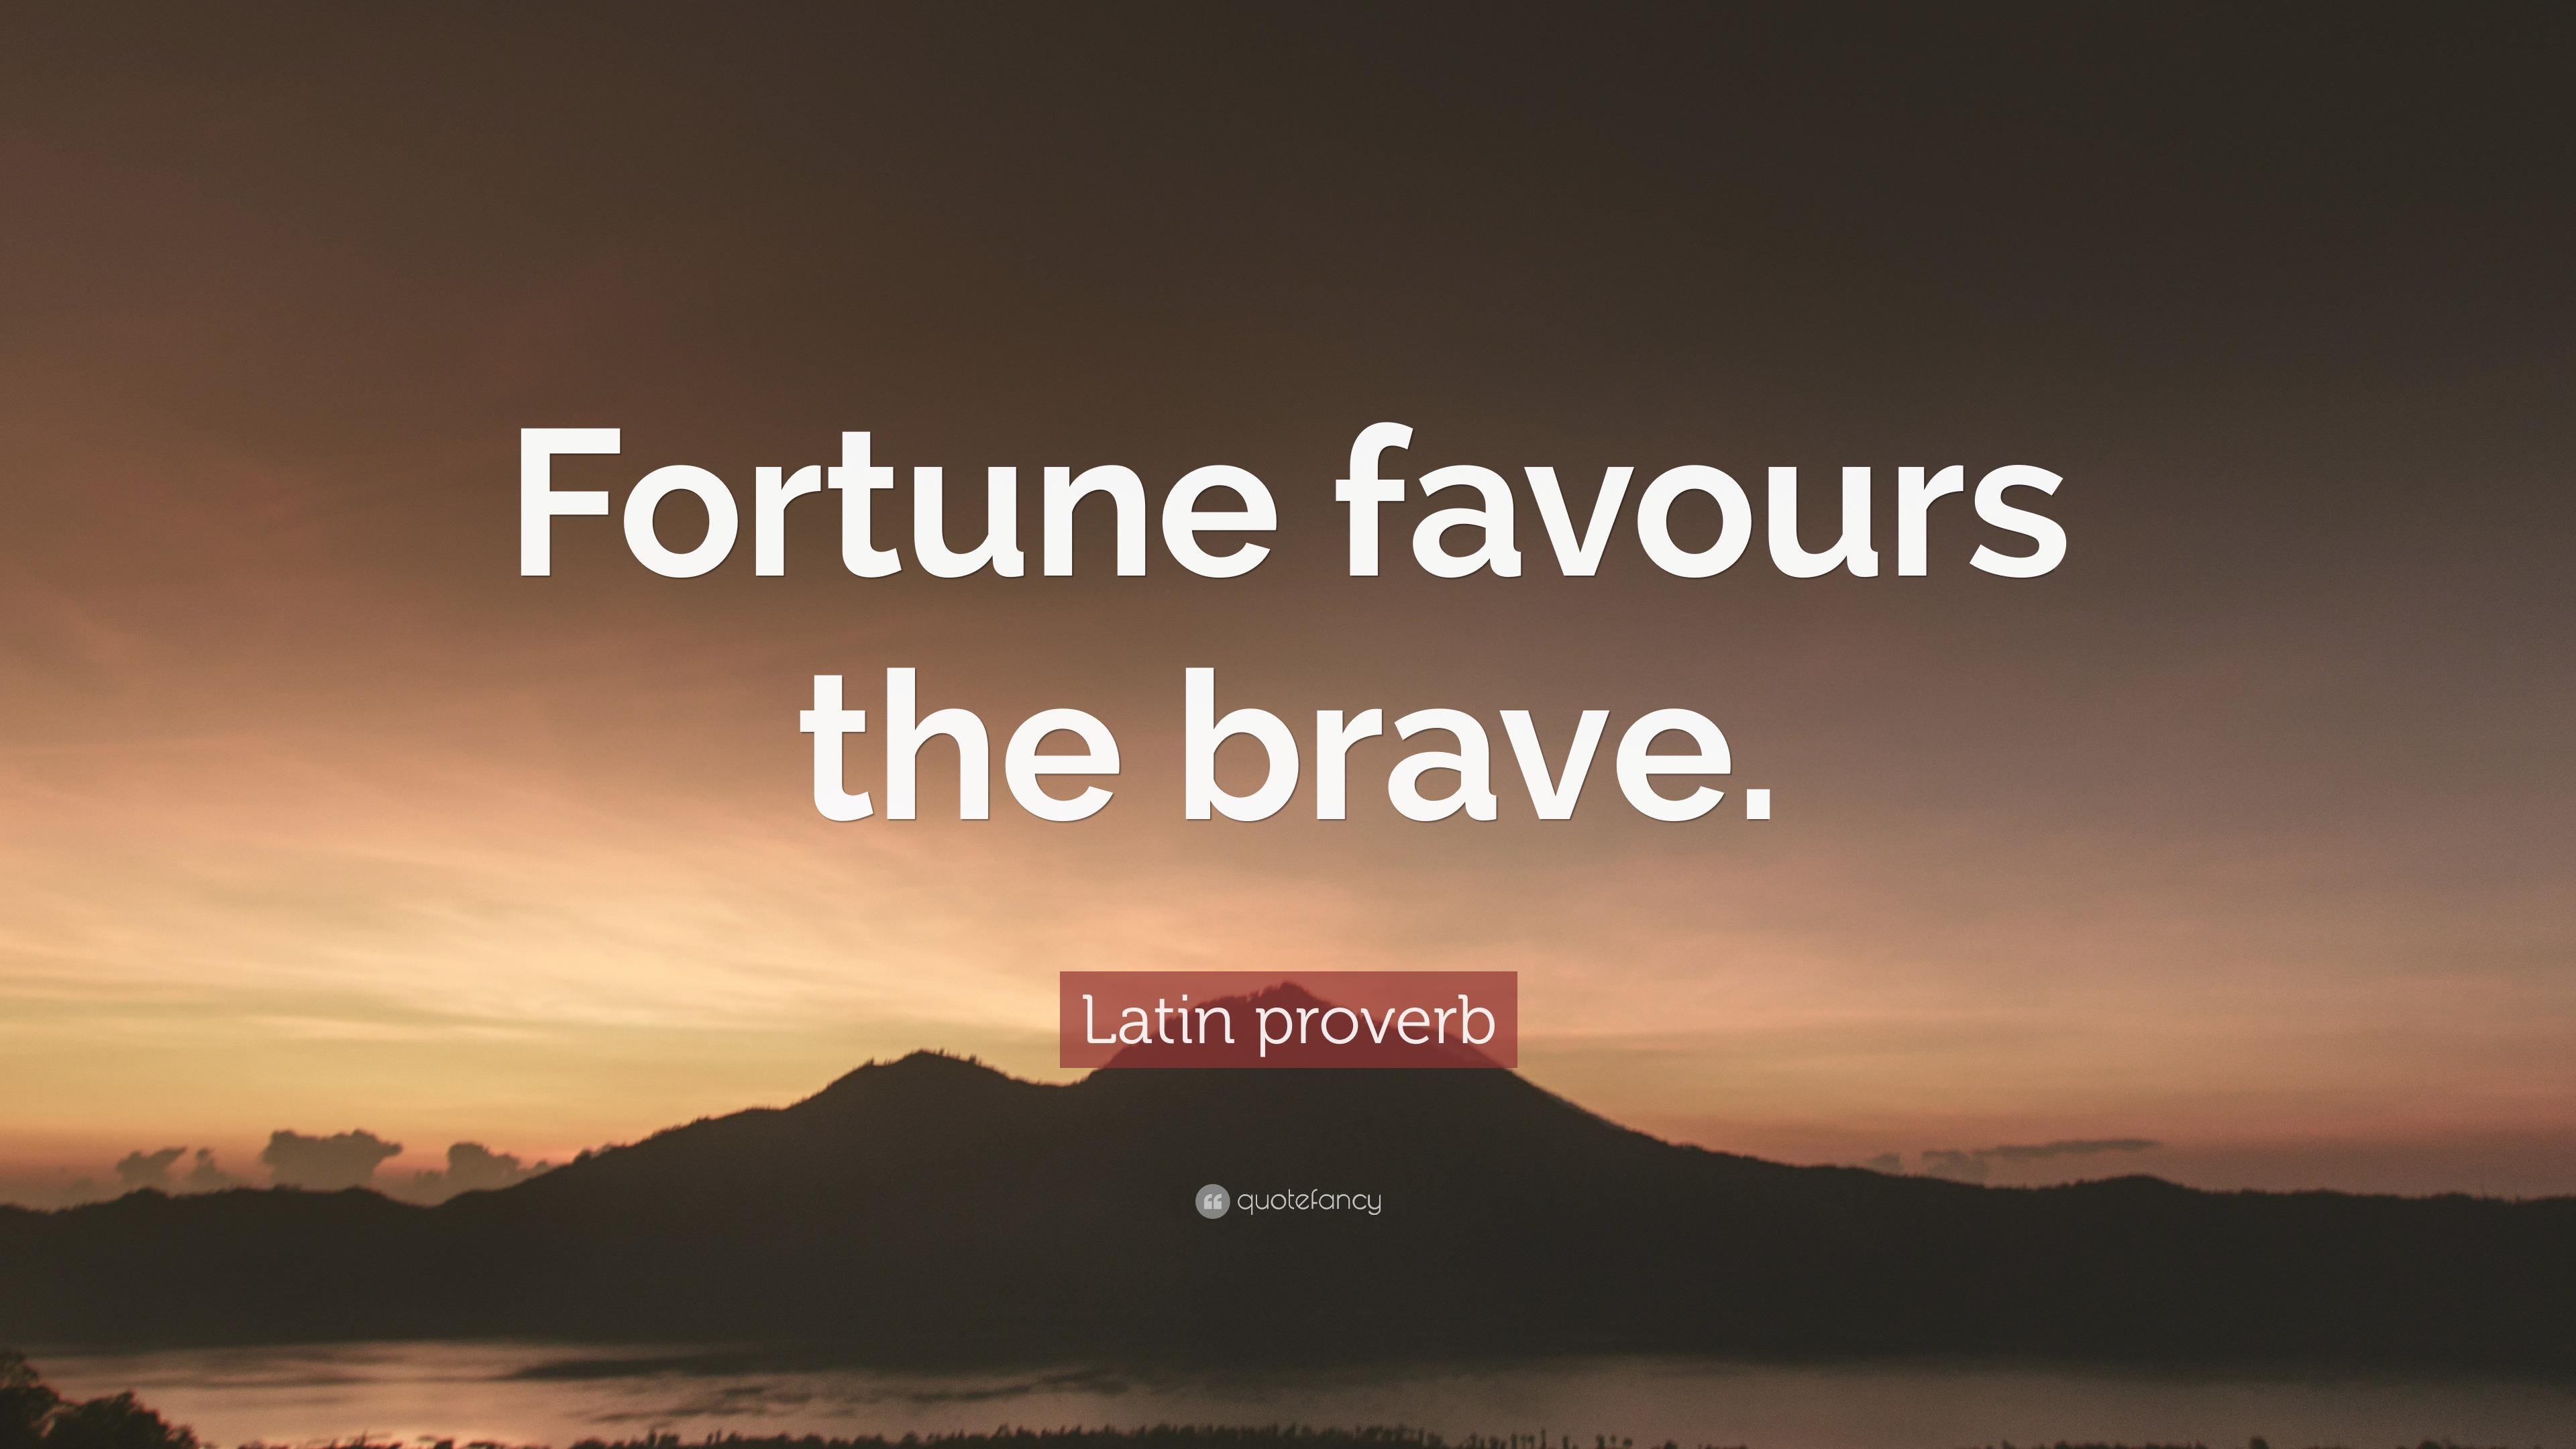 Conor Mcgregor Quote Wallpaper Latin Proverb Quote Fortune Favours The Brave 10